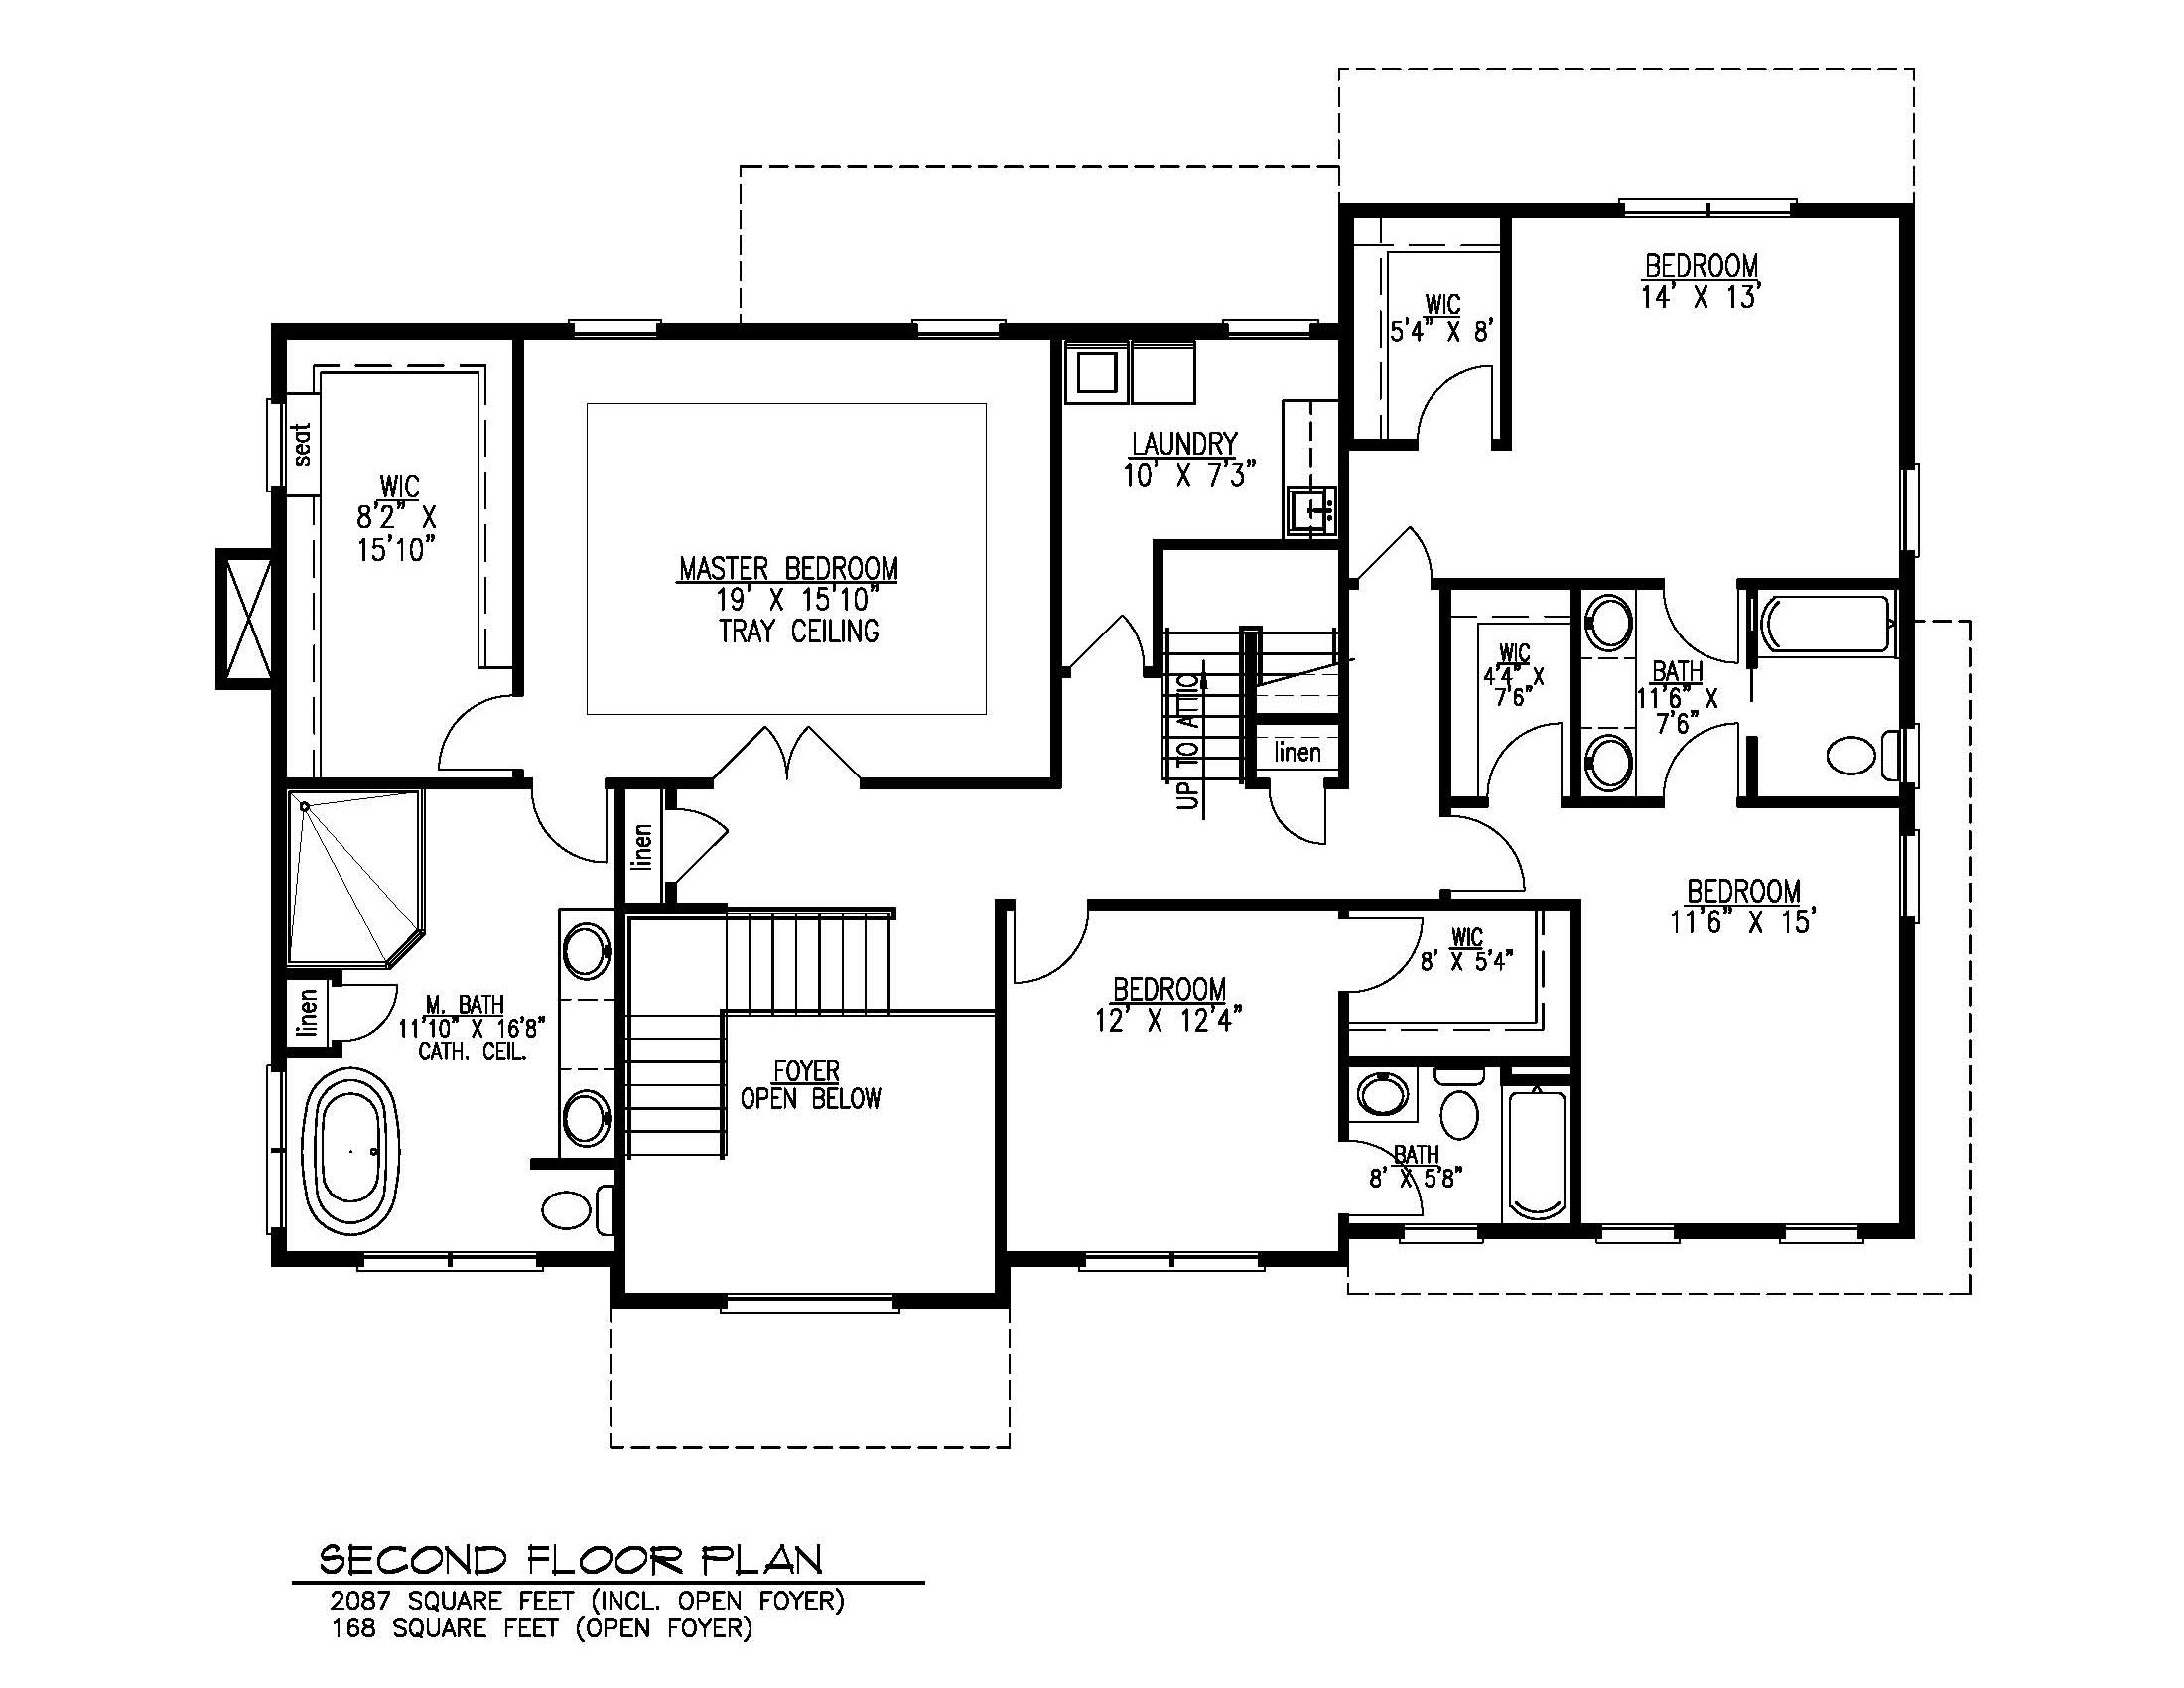 211 Golf Edge Second Floor Plan